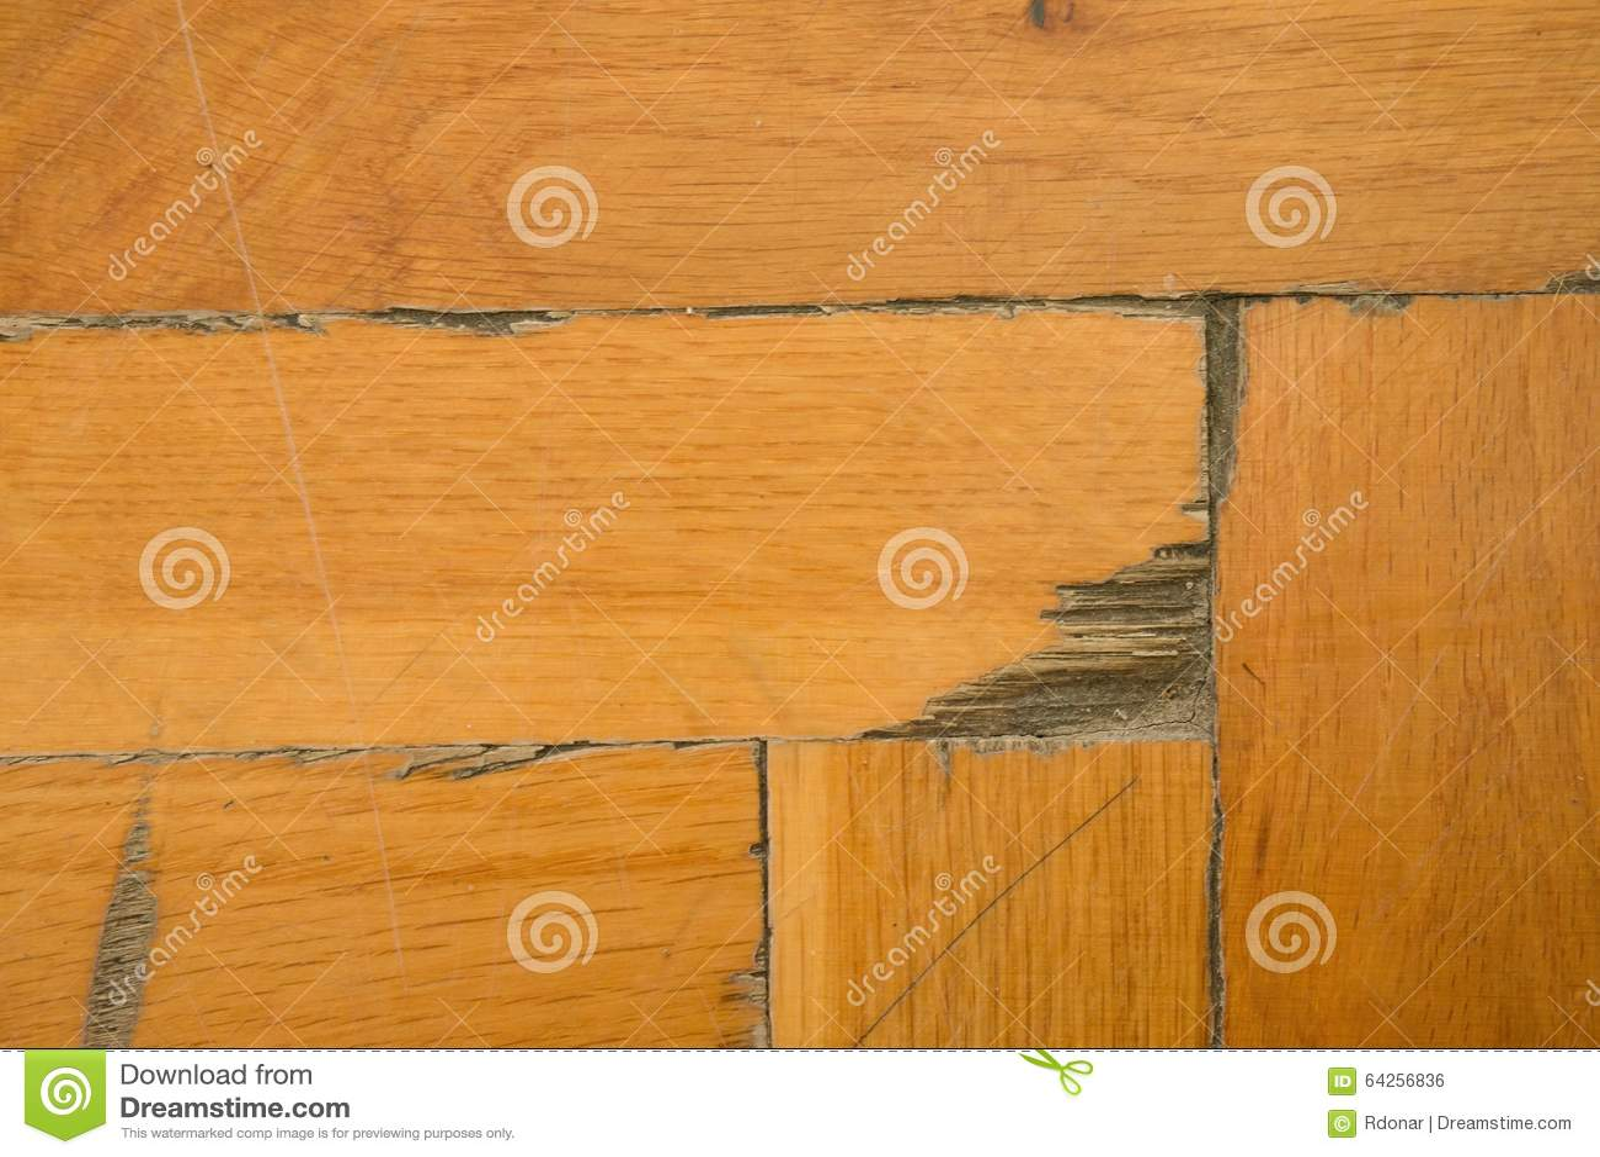 Worn out wooden floor of sports hall light wood flooring Worn wood floors